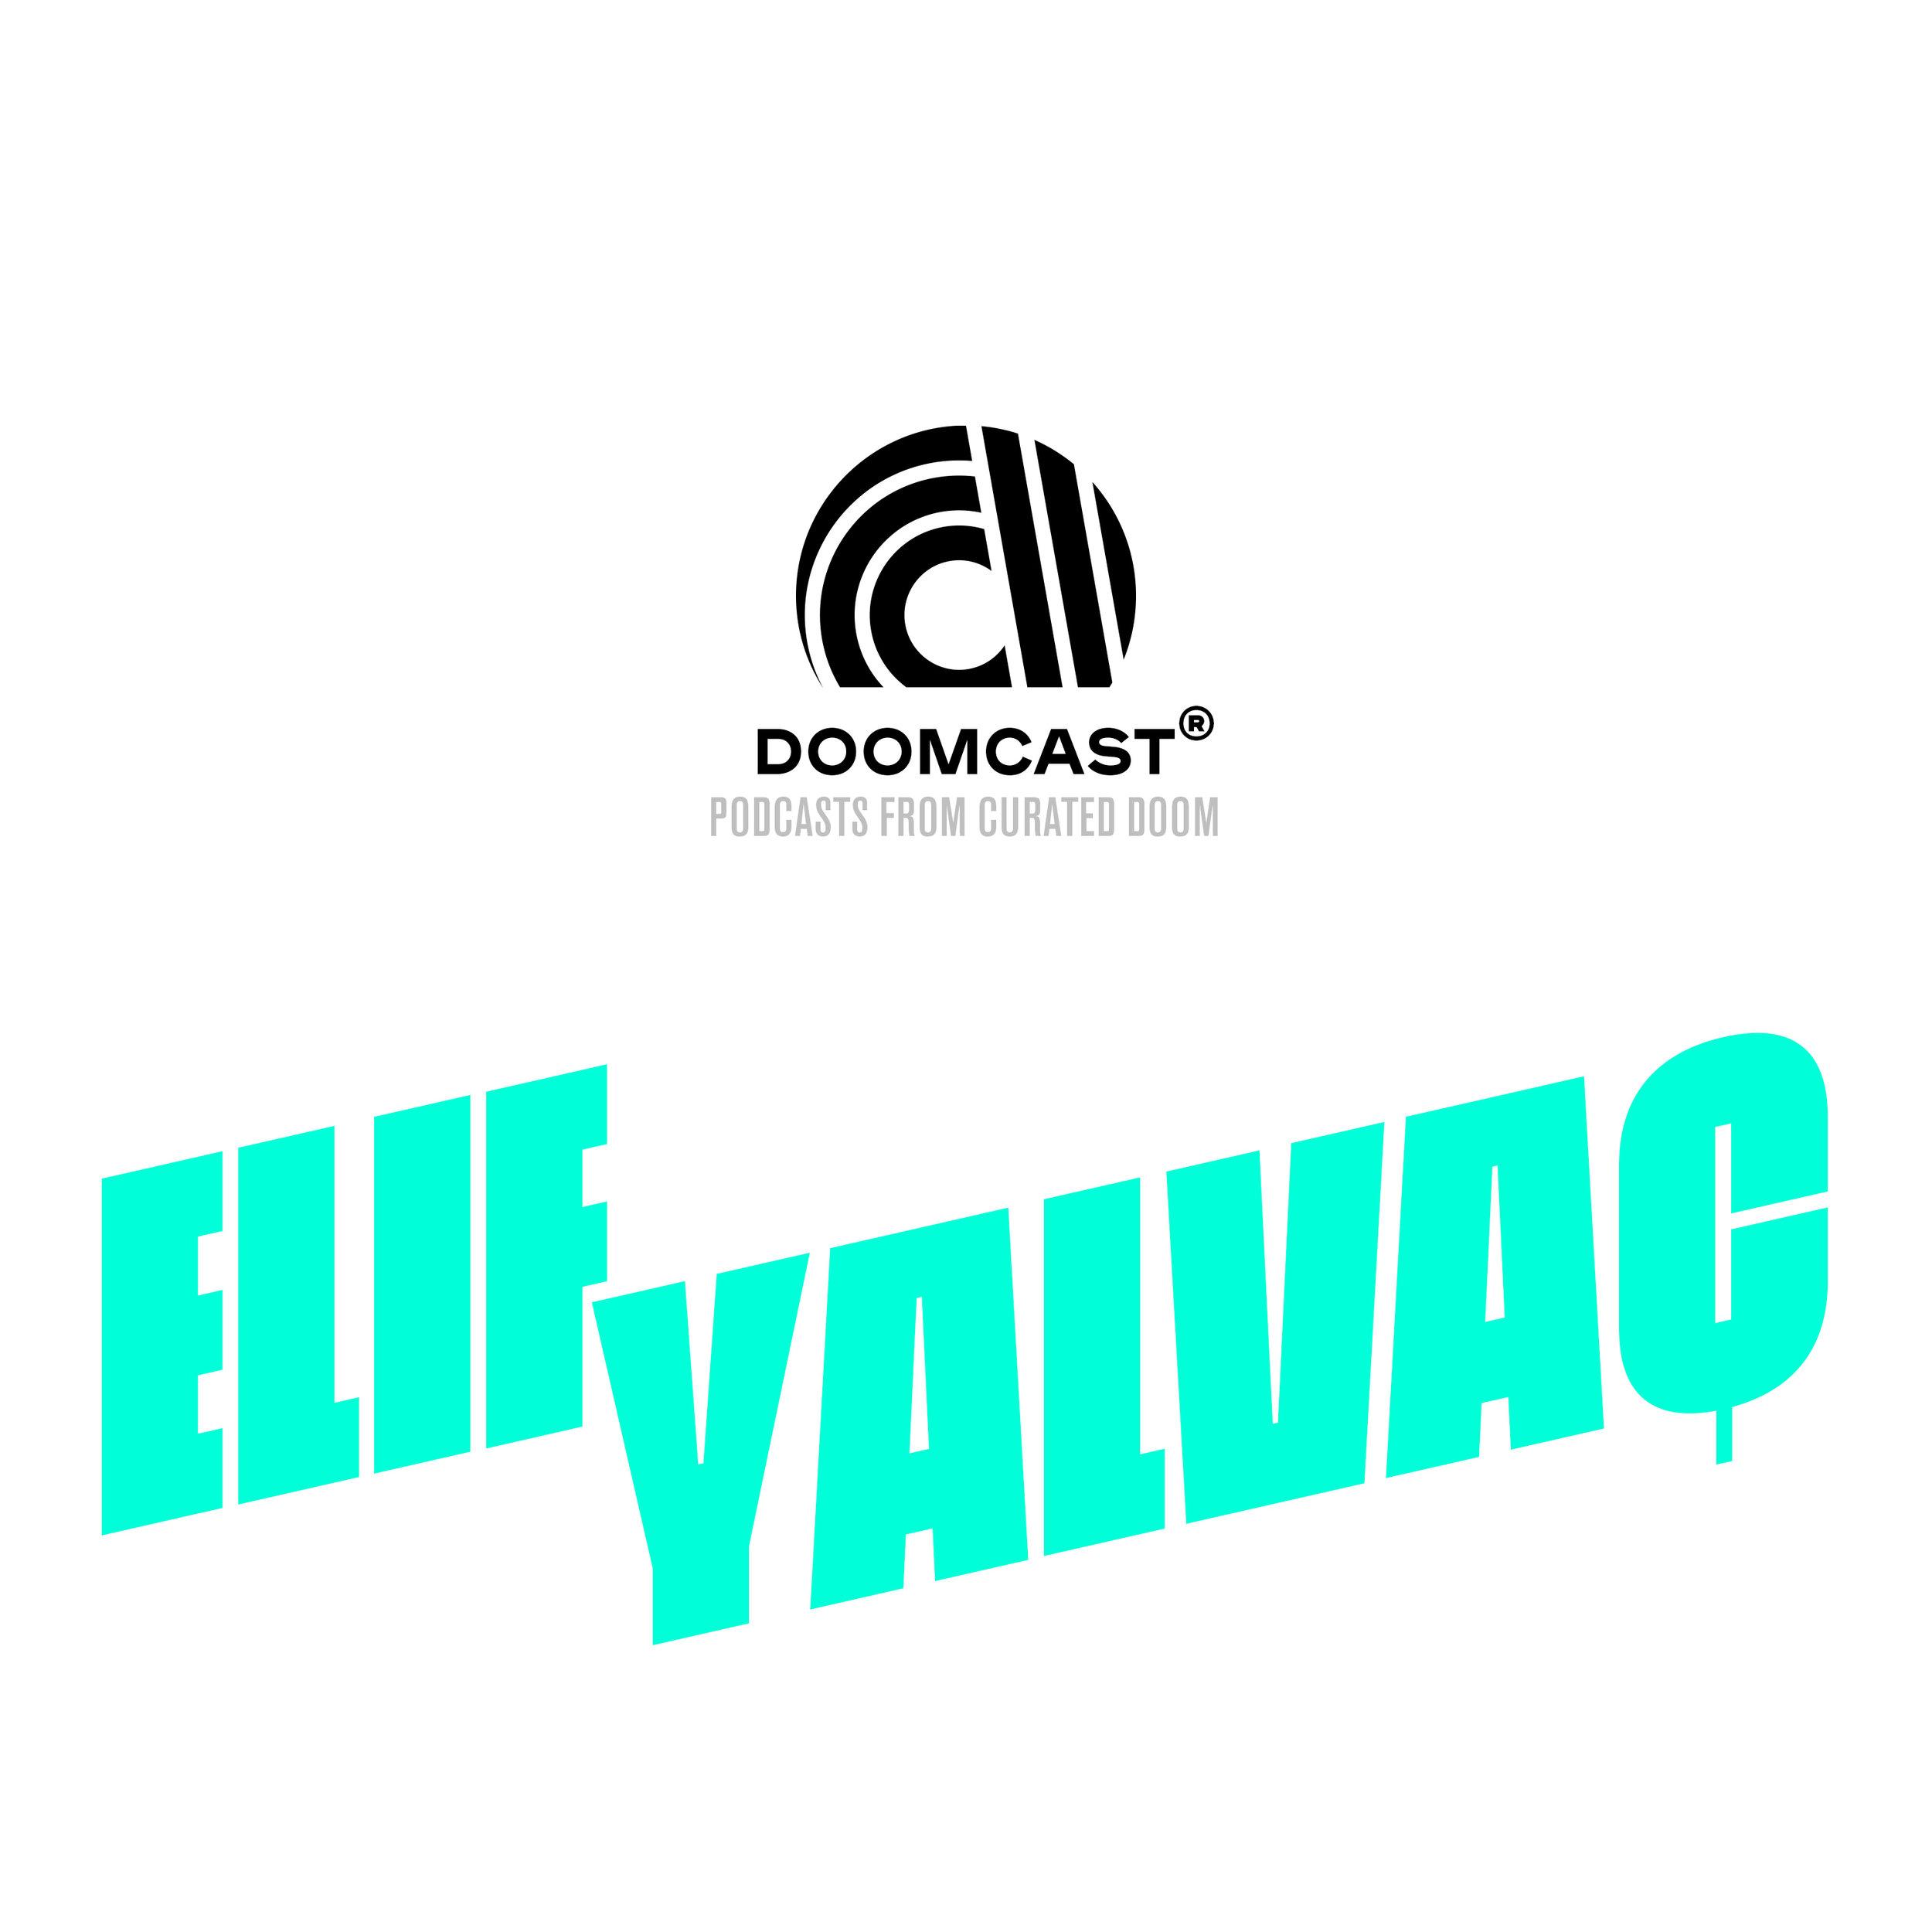 DOOMCAST-Elif_Promo01.jpg